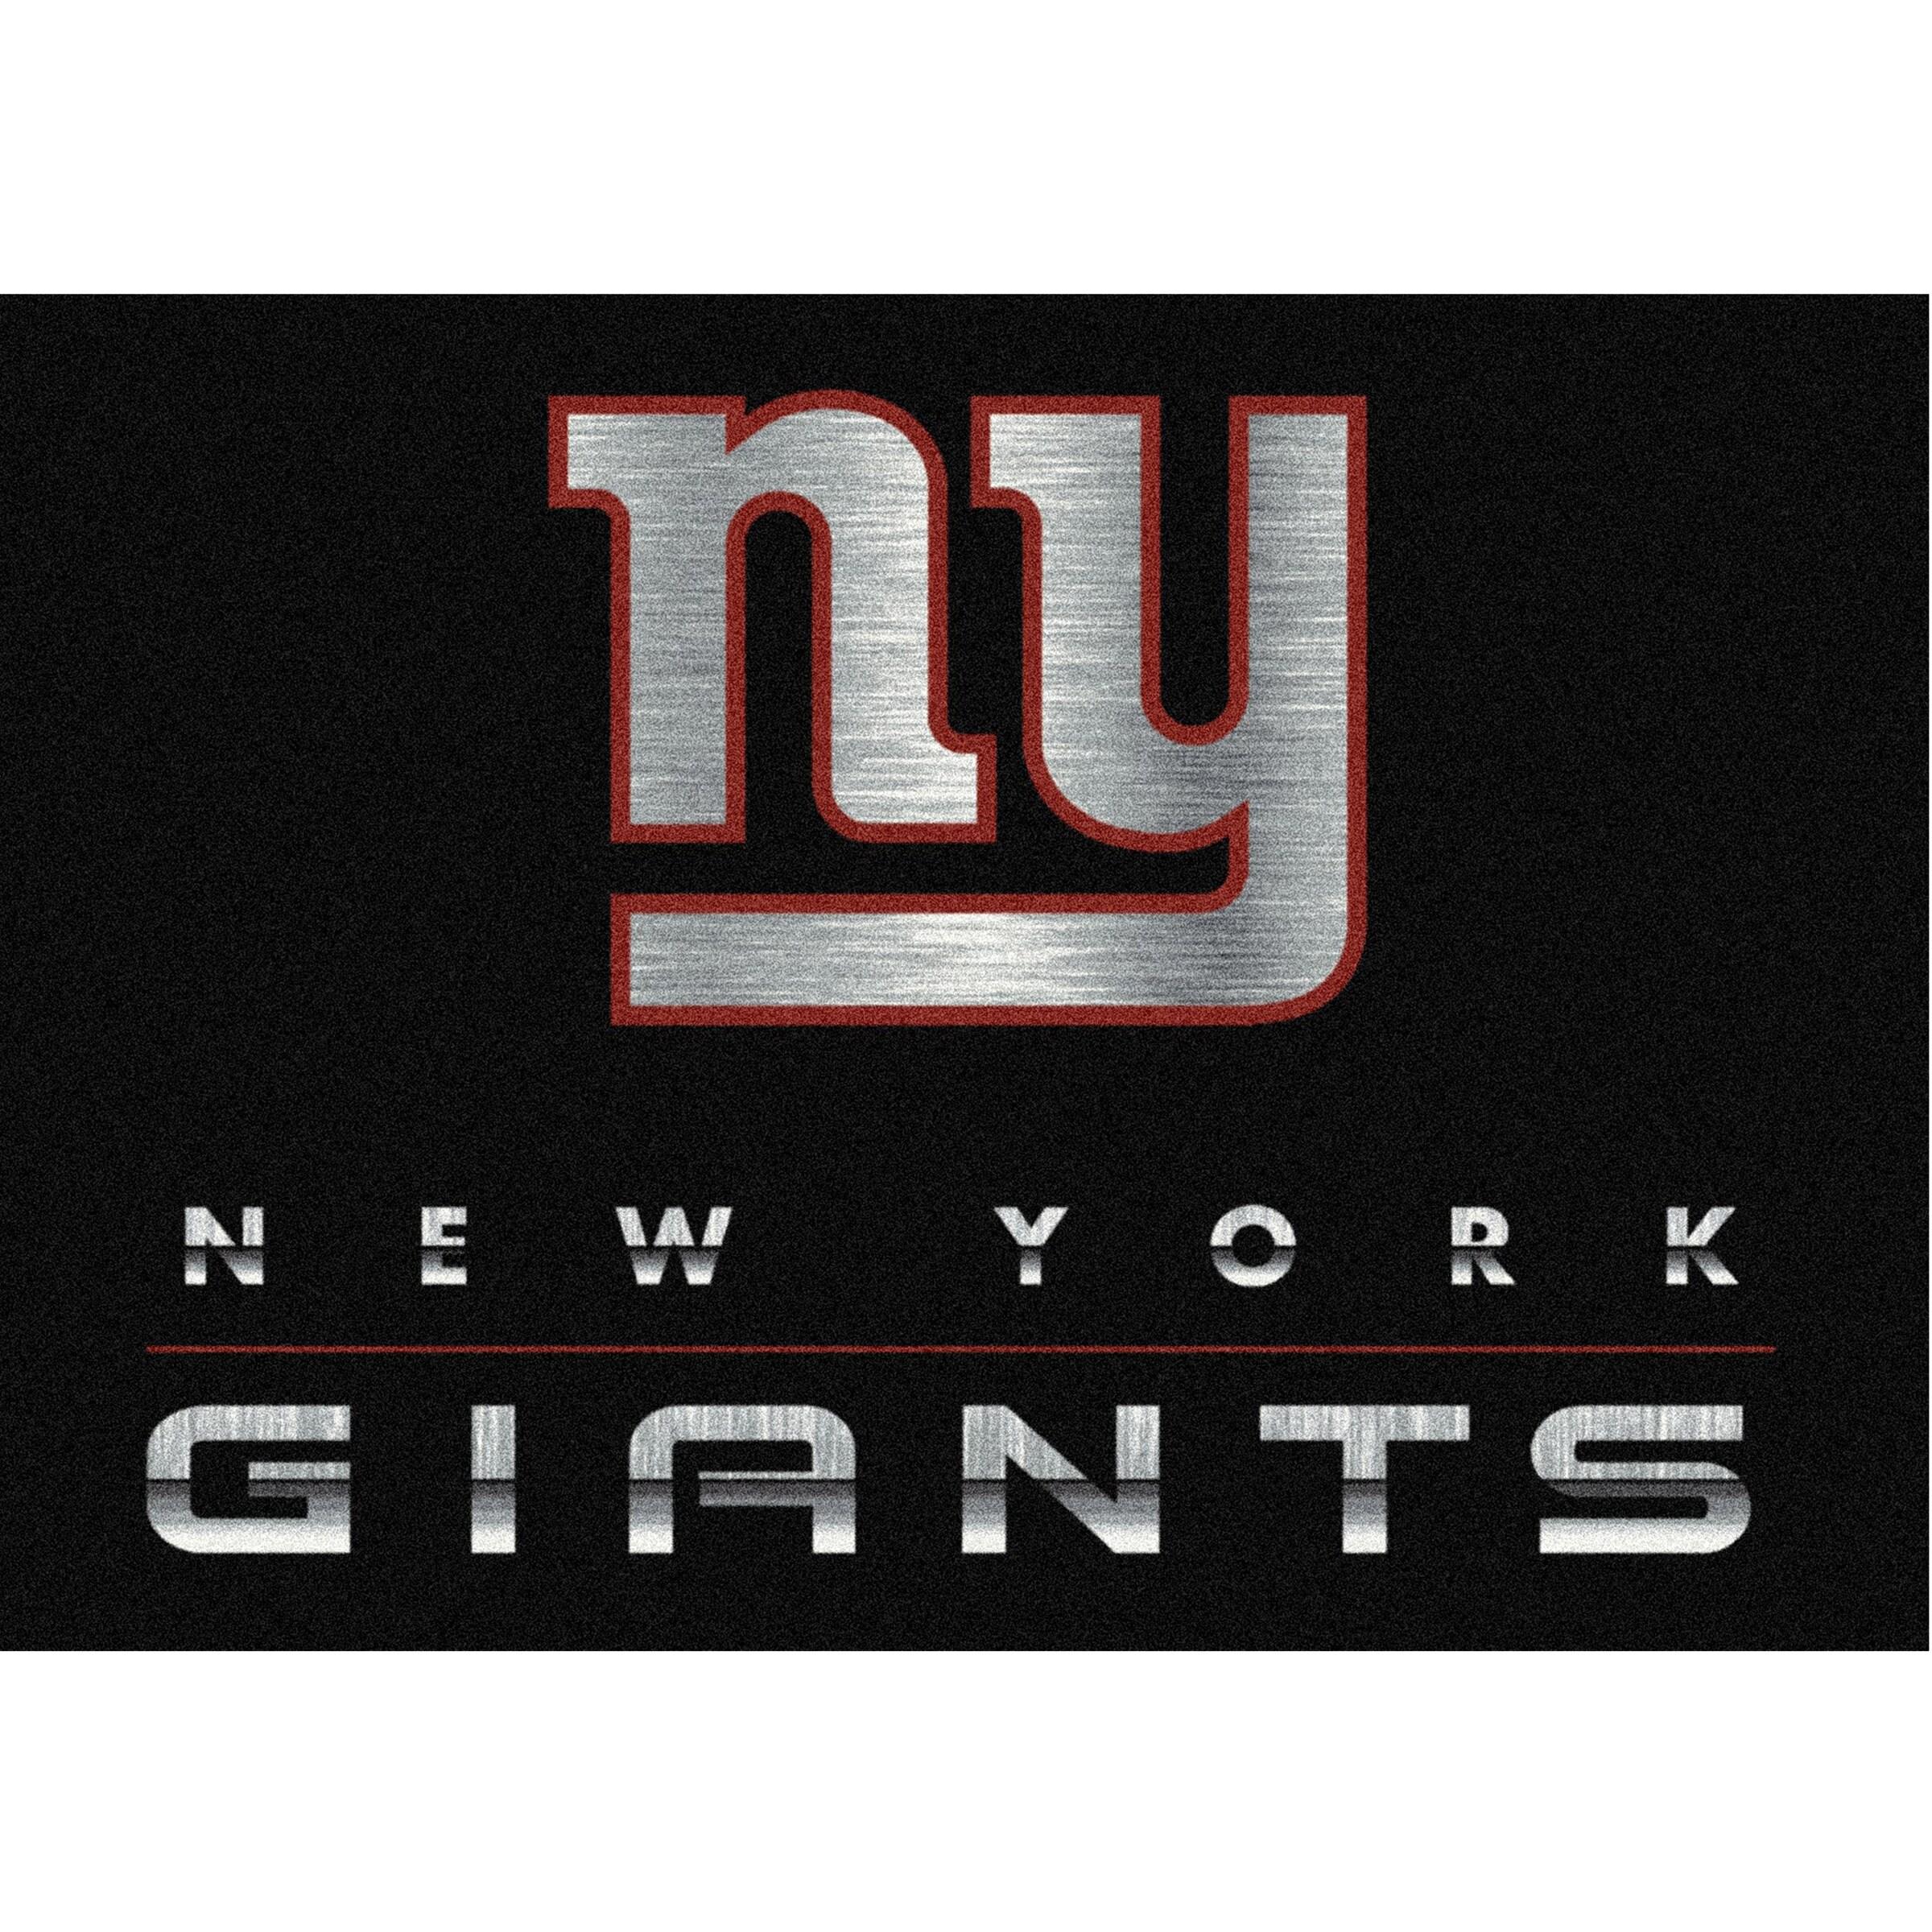 New York Giants Imperial 8' x 11' Chrome Rug